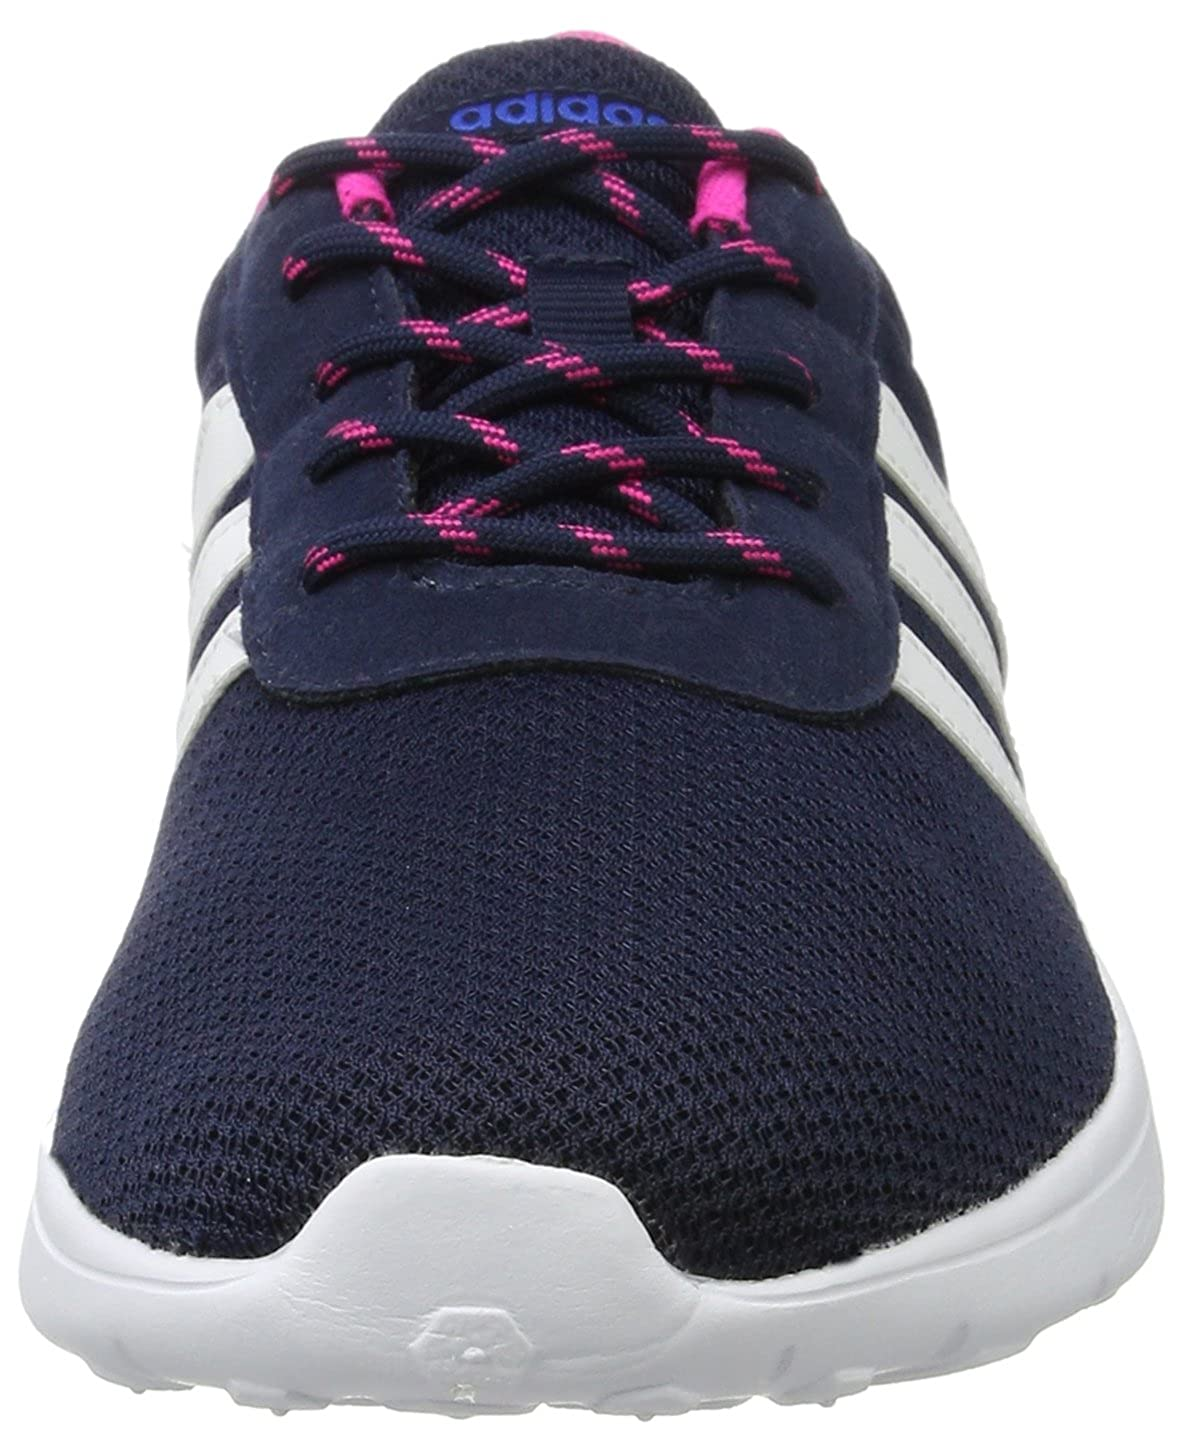 adidas Damen Lite Racer W Sneaker Low Hals Blau (Maruni